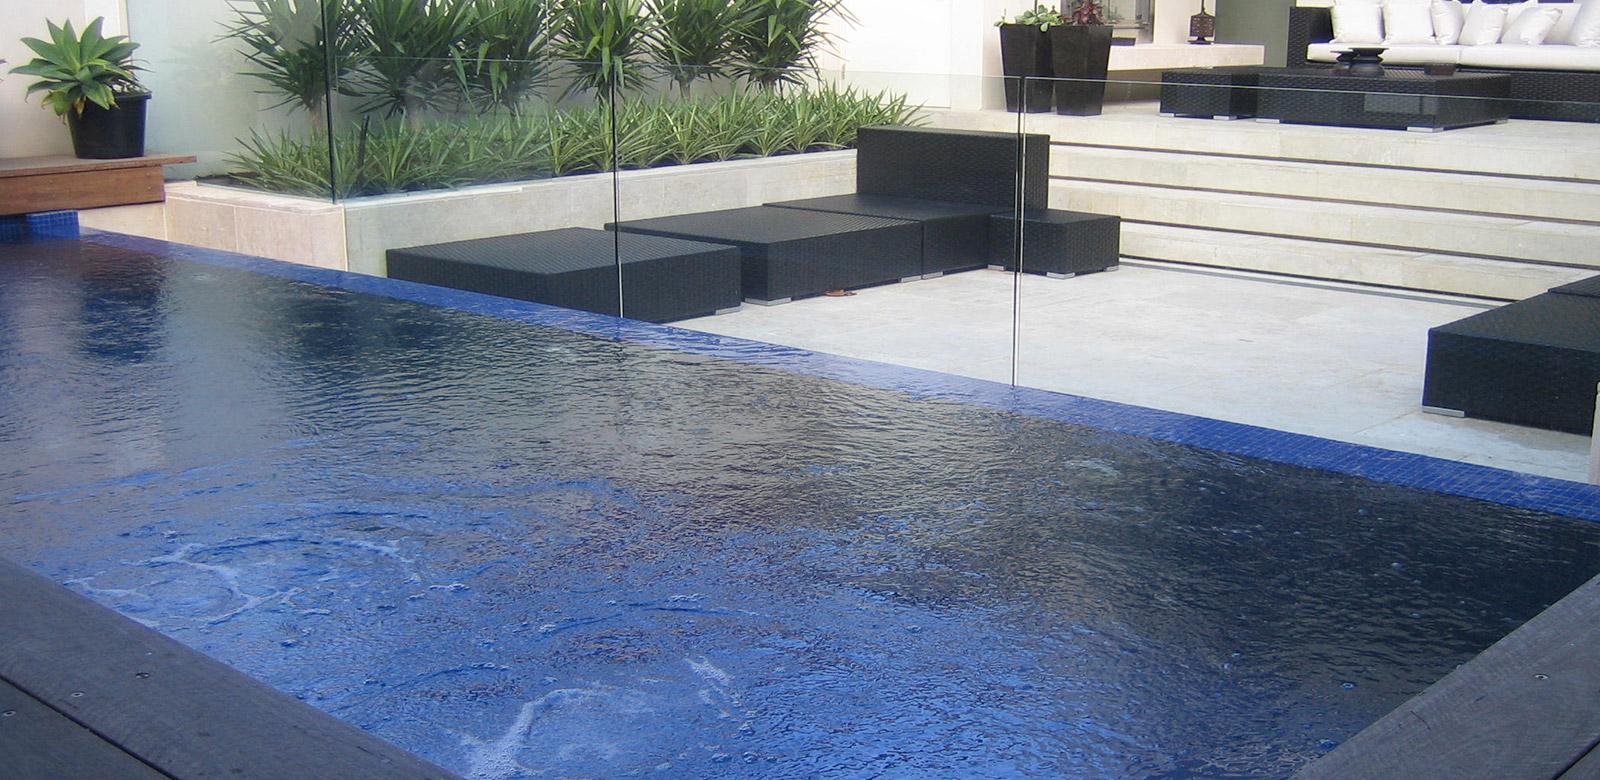 Infinity Pool Melbourne